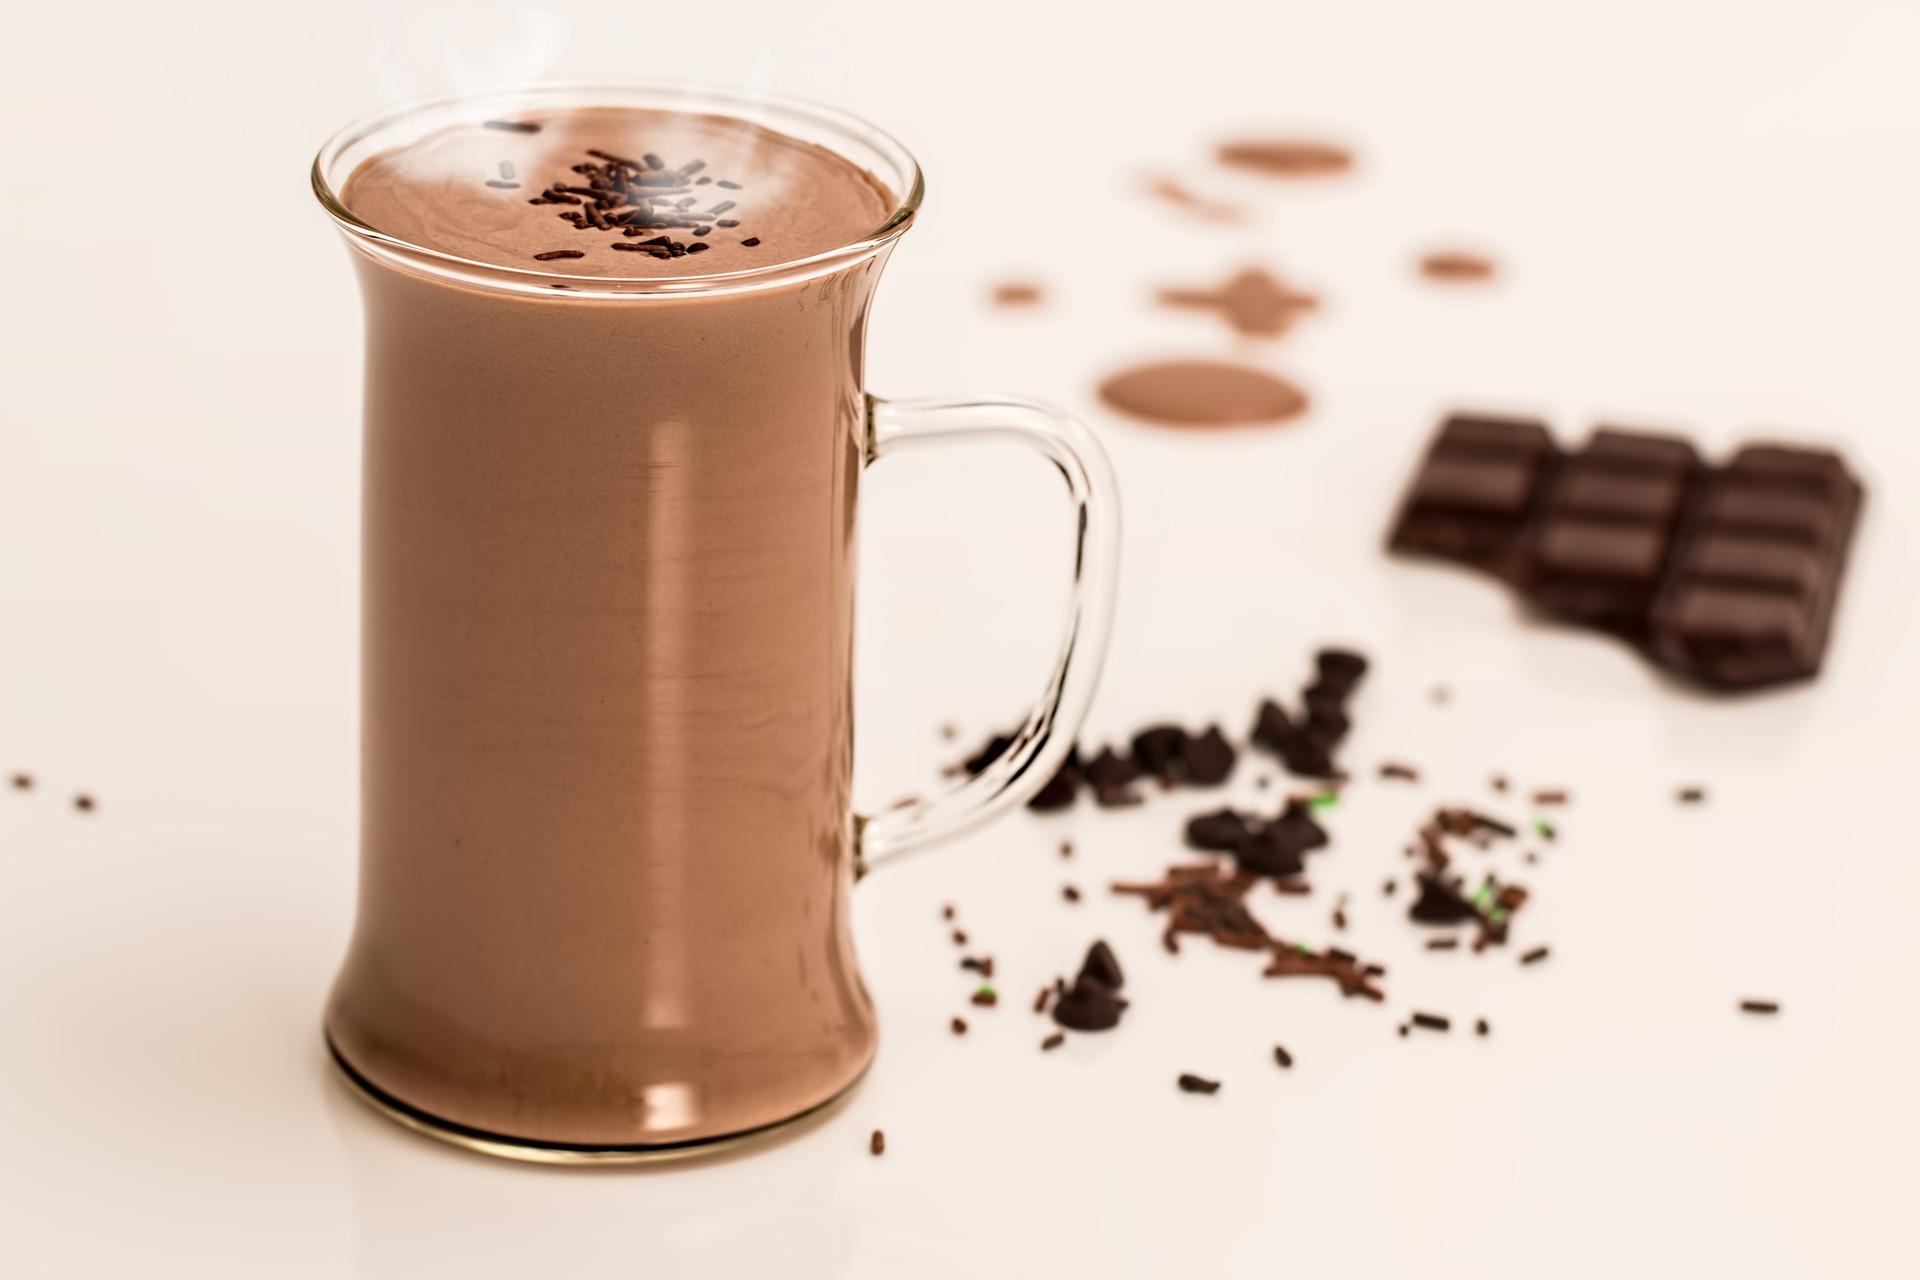 Chocolate Milk - 1/2 Gallon